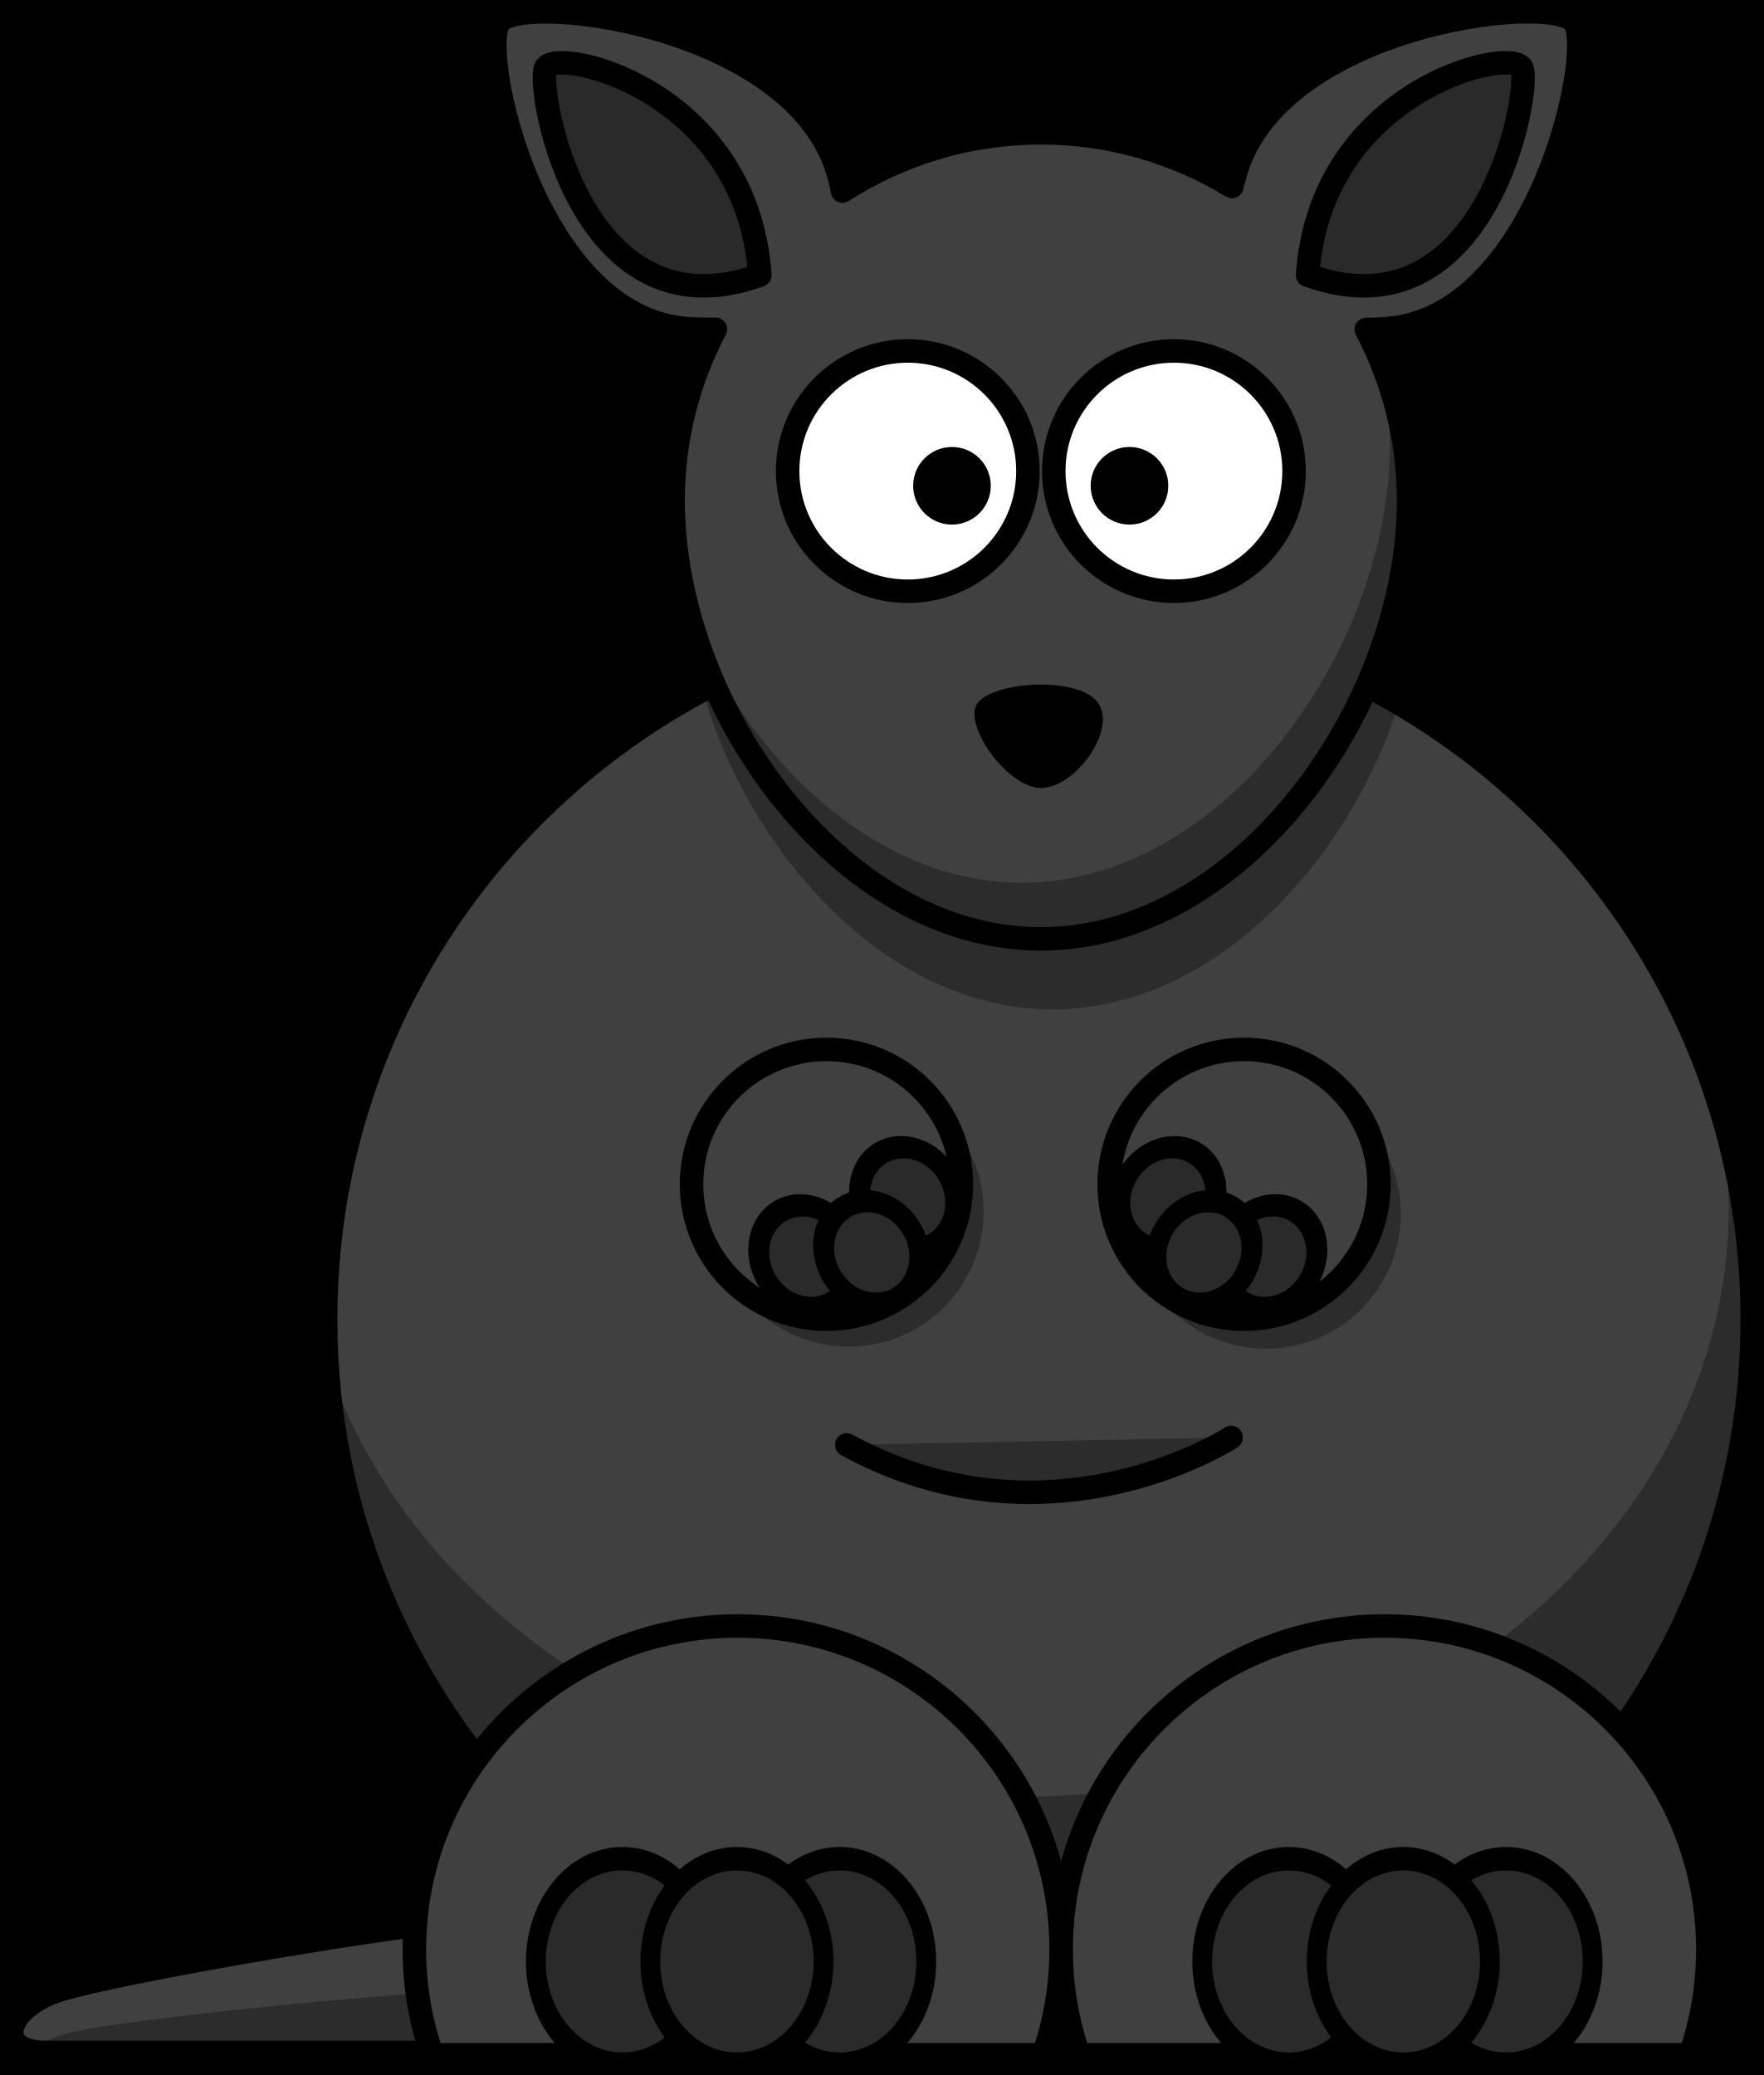 Cartoon clipartblack com animal. Kangaroo clipart black and white